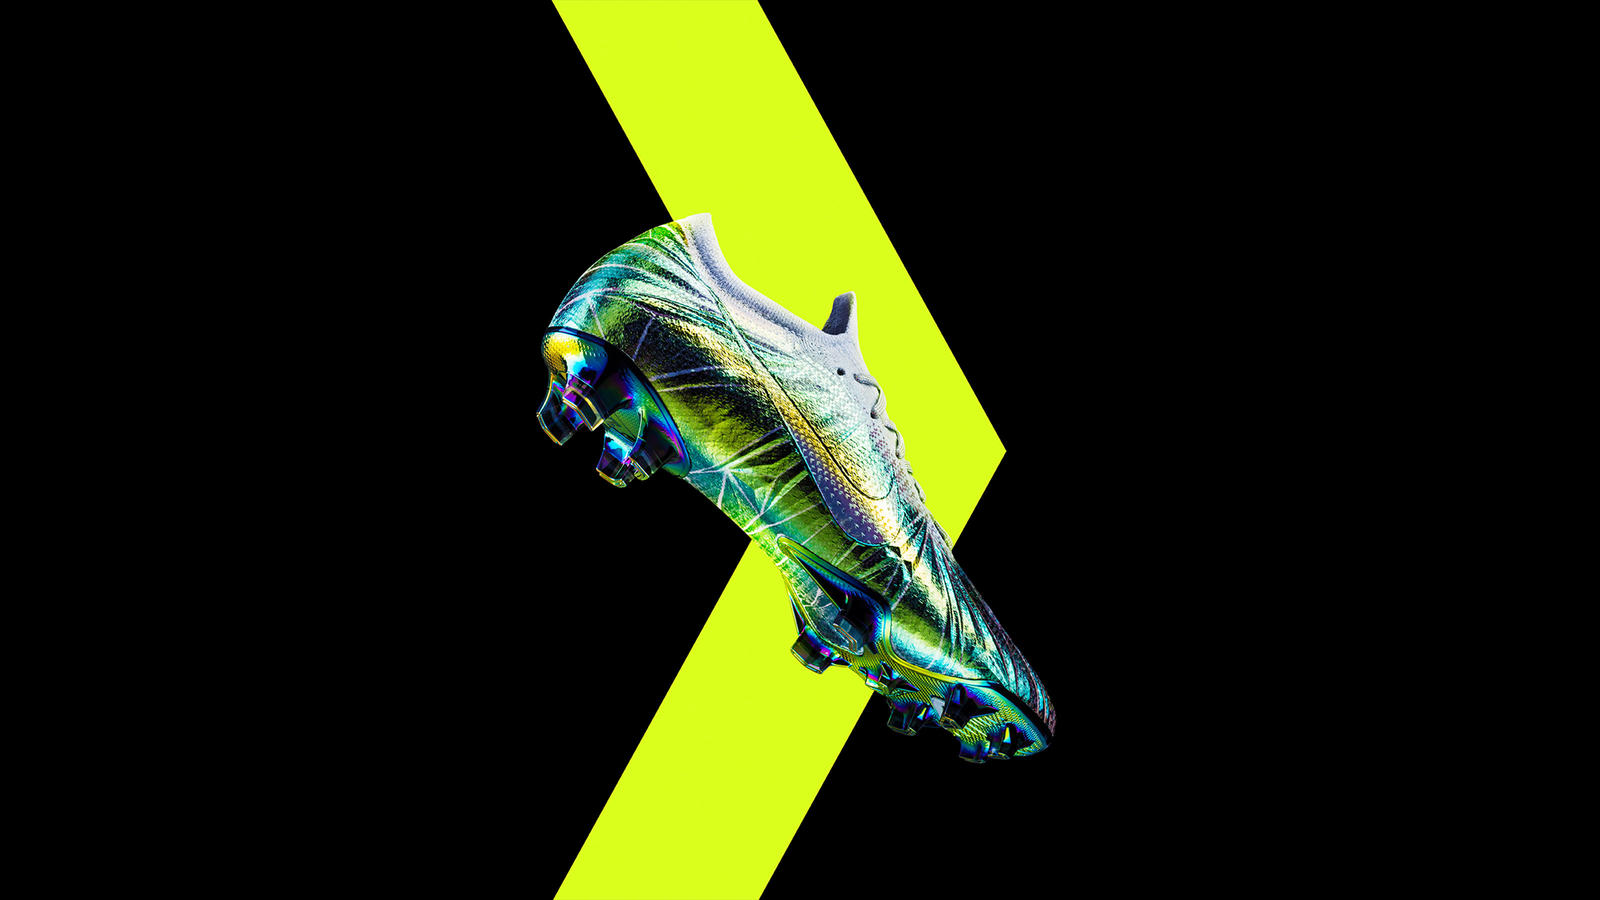 Chaussure Nike Mercurial Vapor 12 Luka Modric